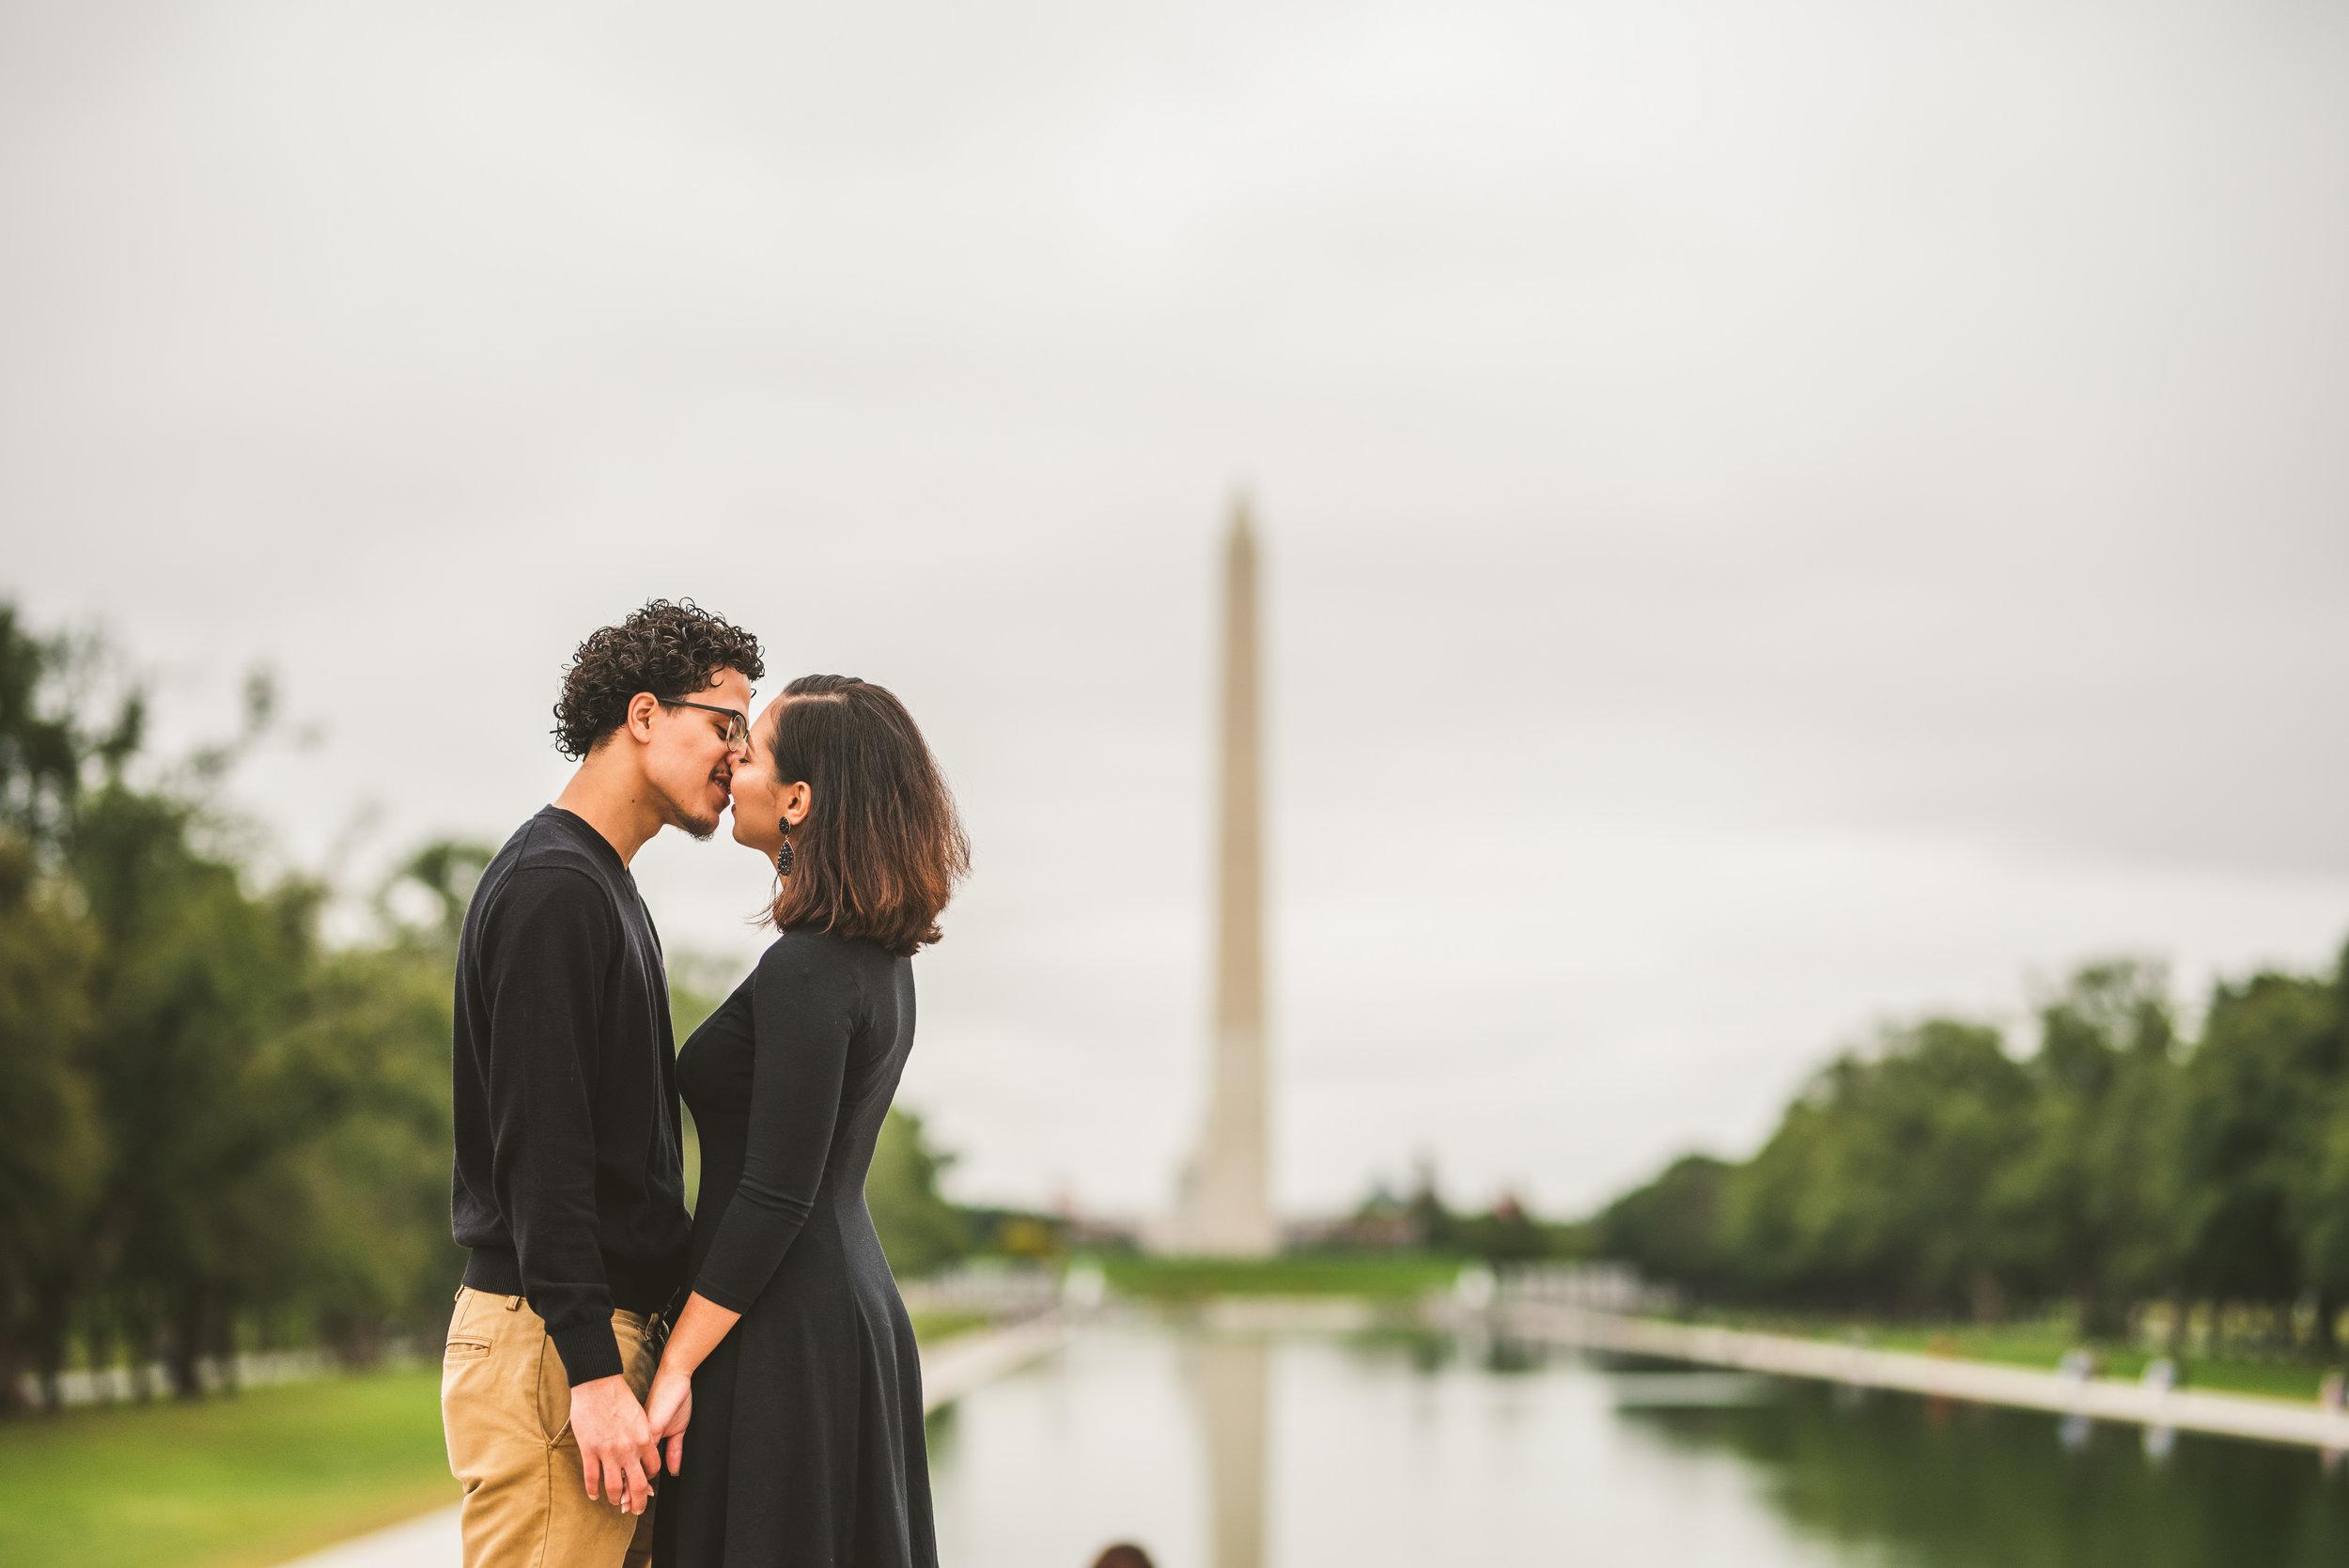 Couple Kissing infront of the Washington Monument in Washington D.C